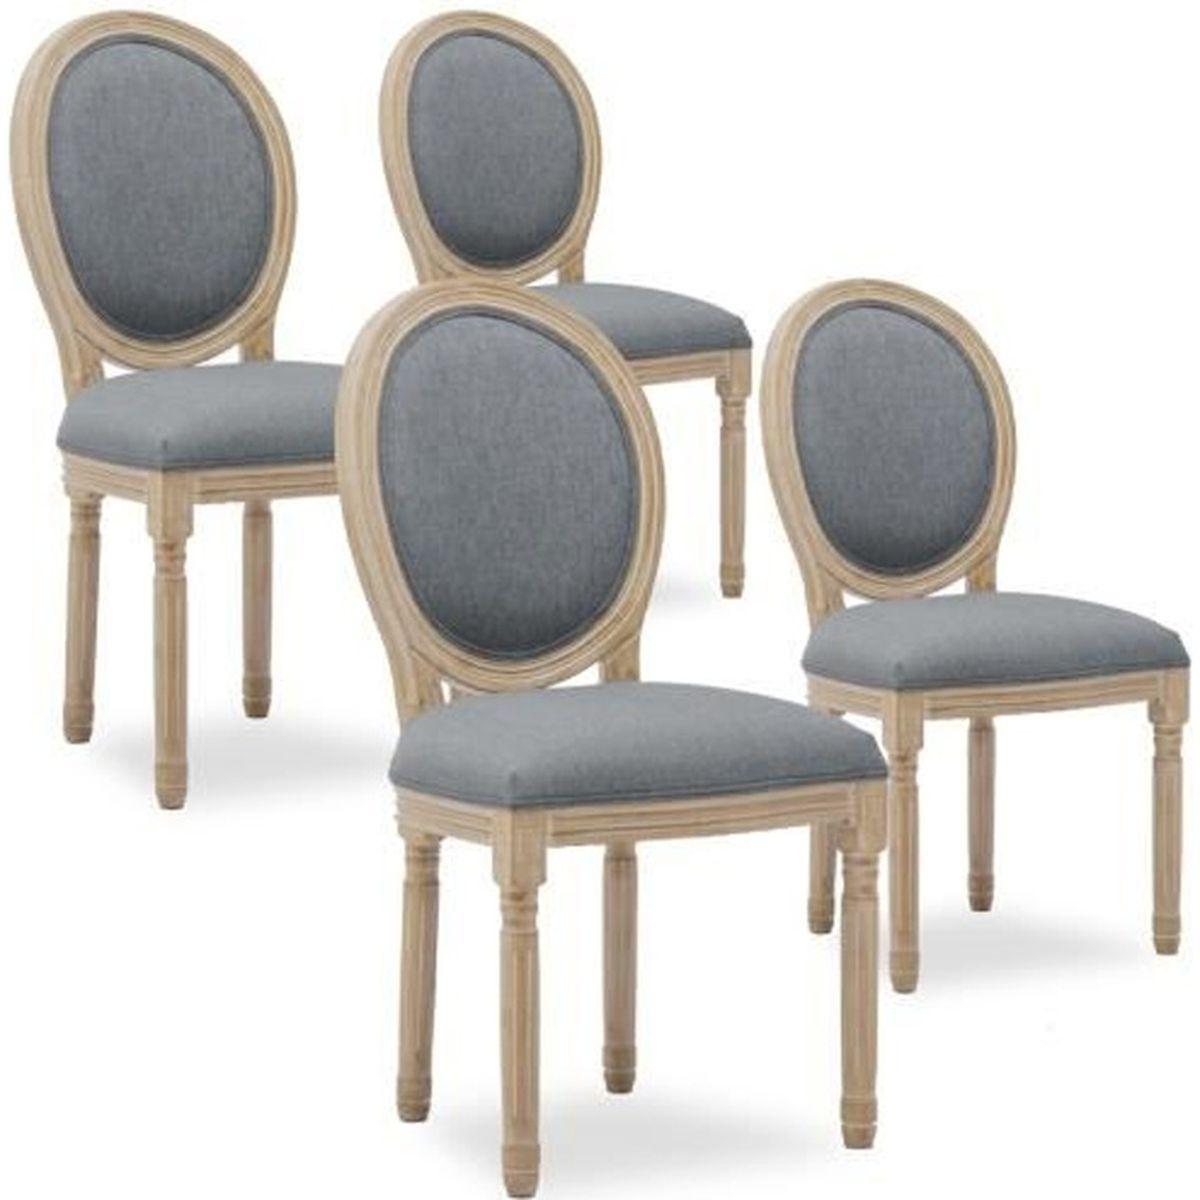 Quel Tissu Pour Chaise chaise medaillon bois